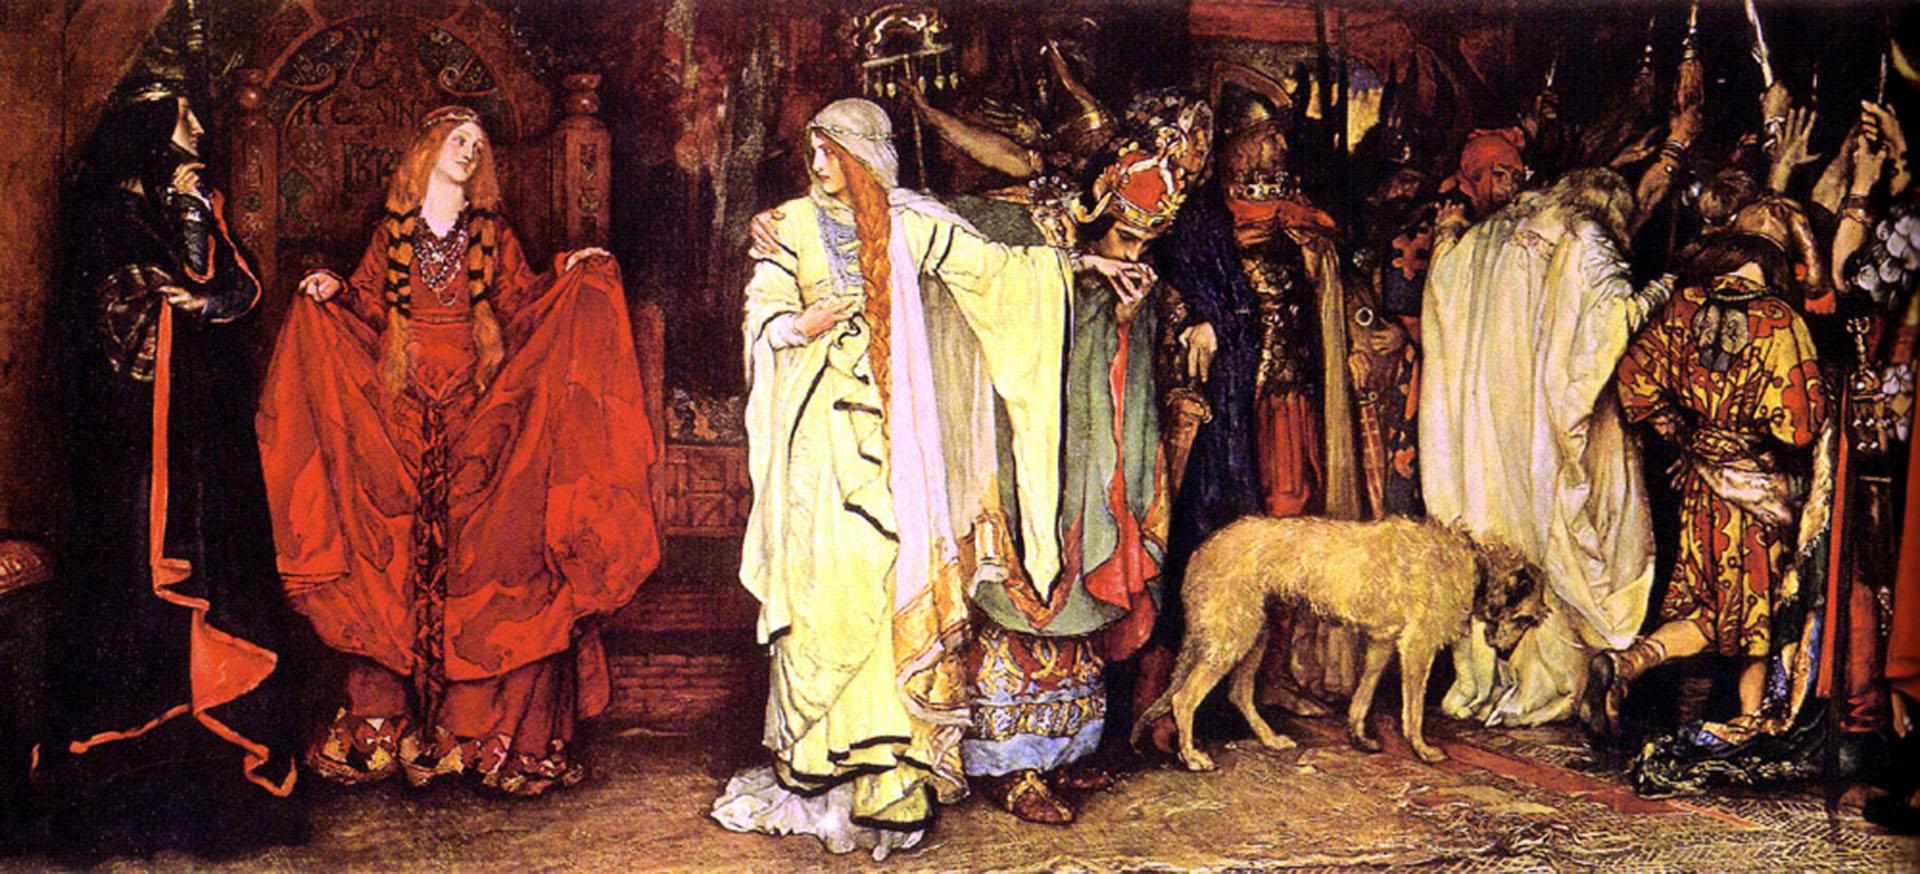 King Lear Cordelias Farewell